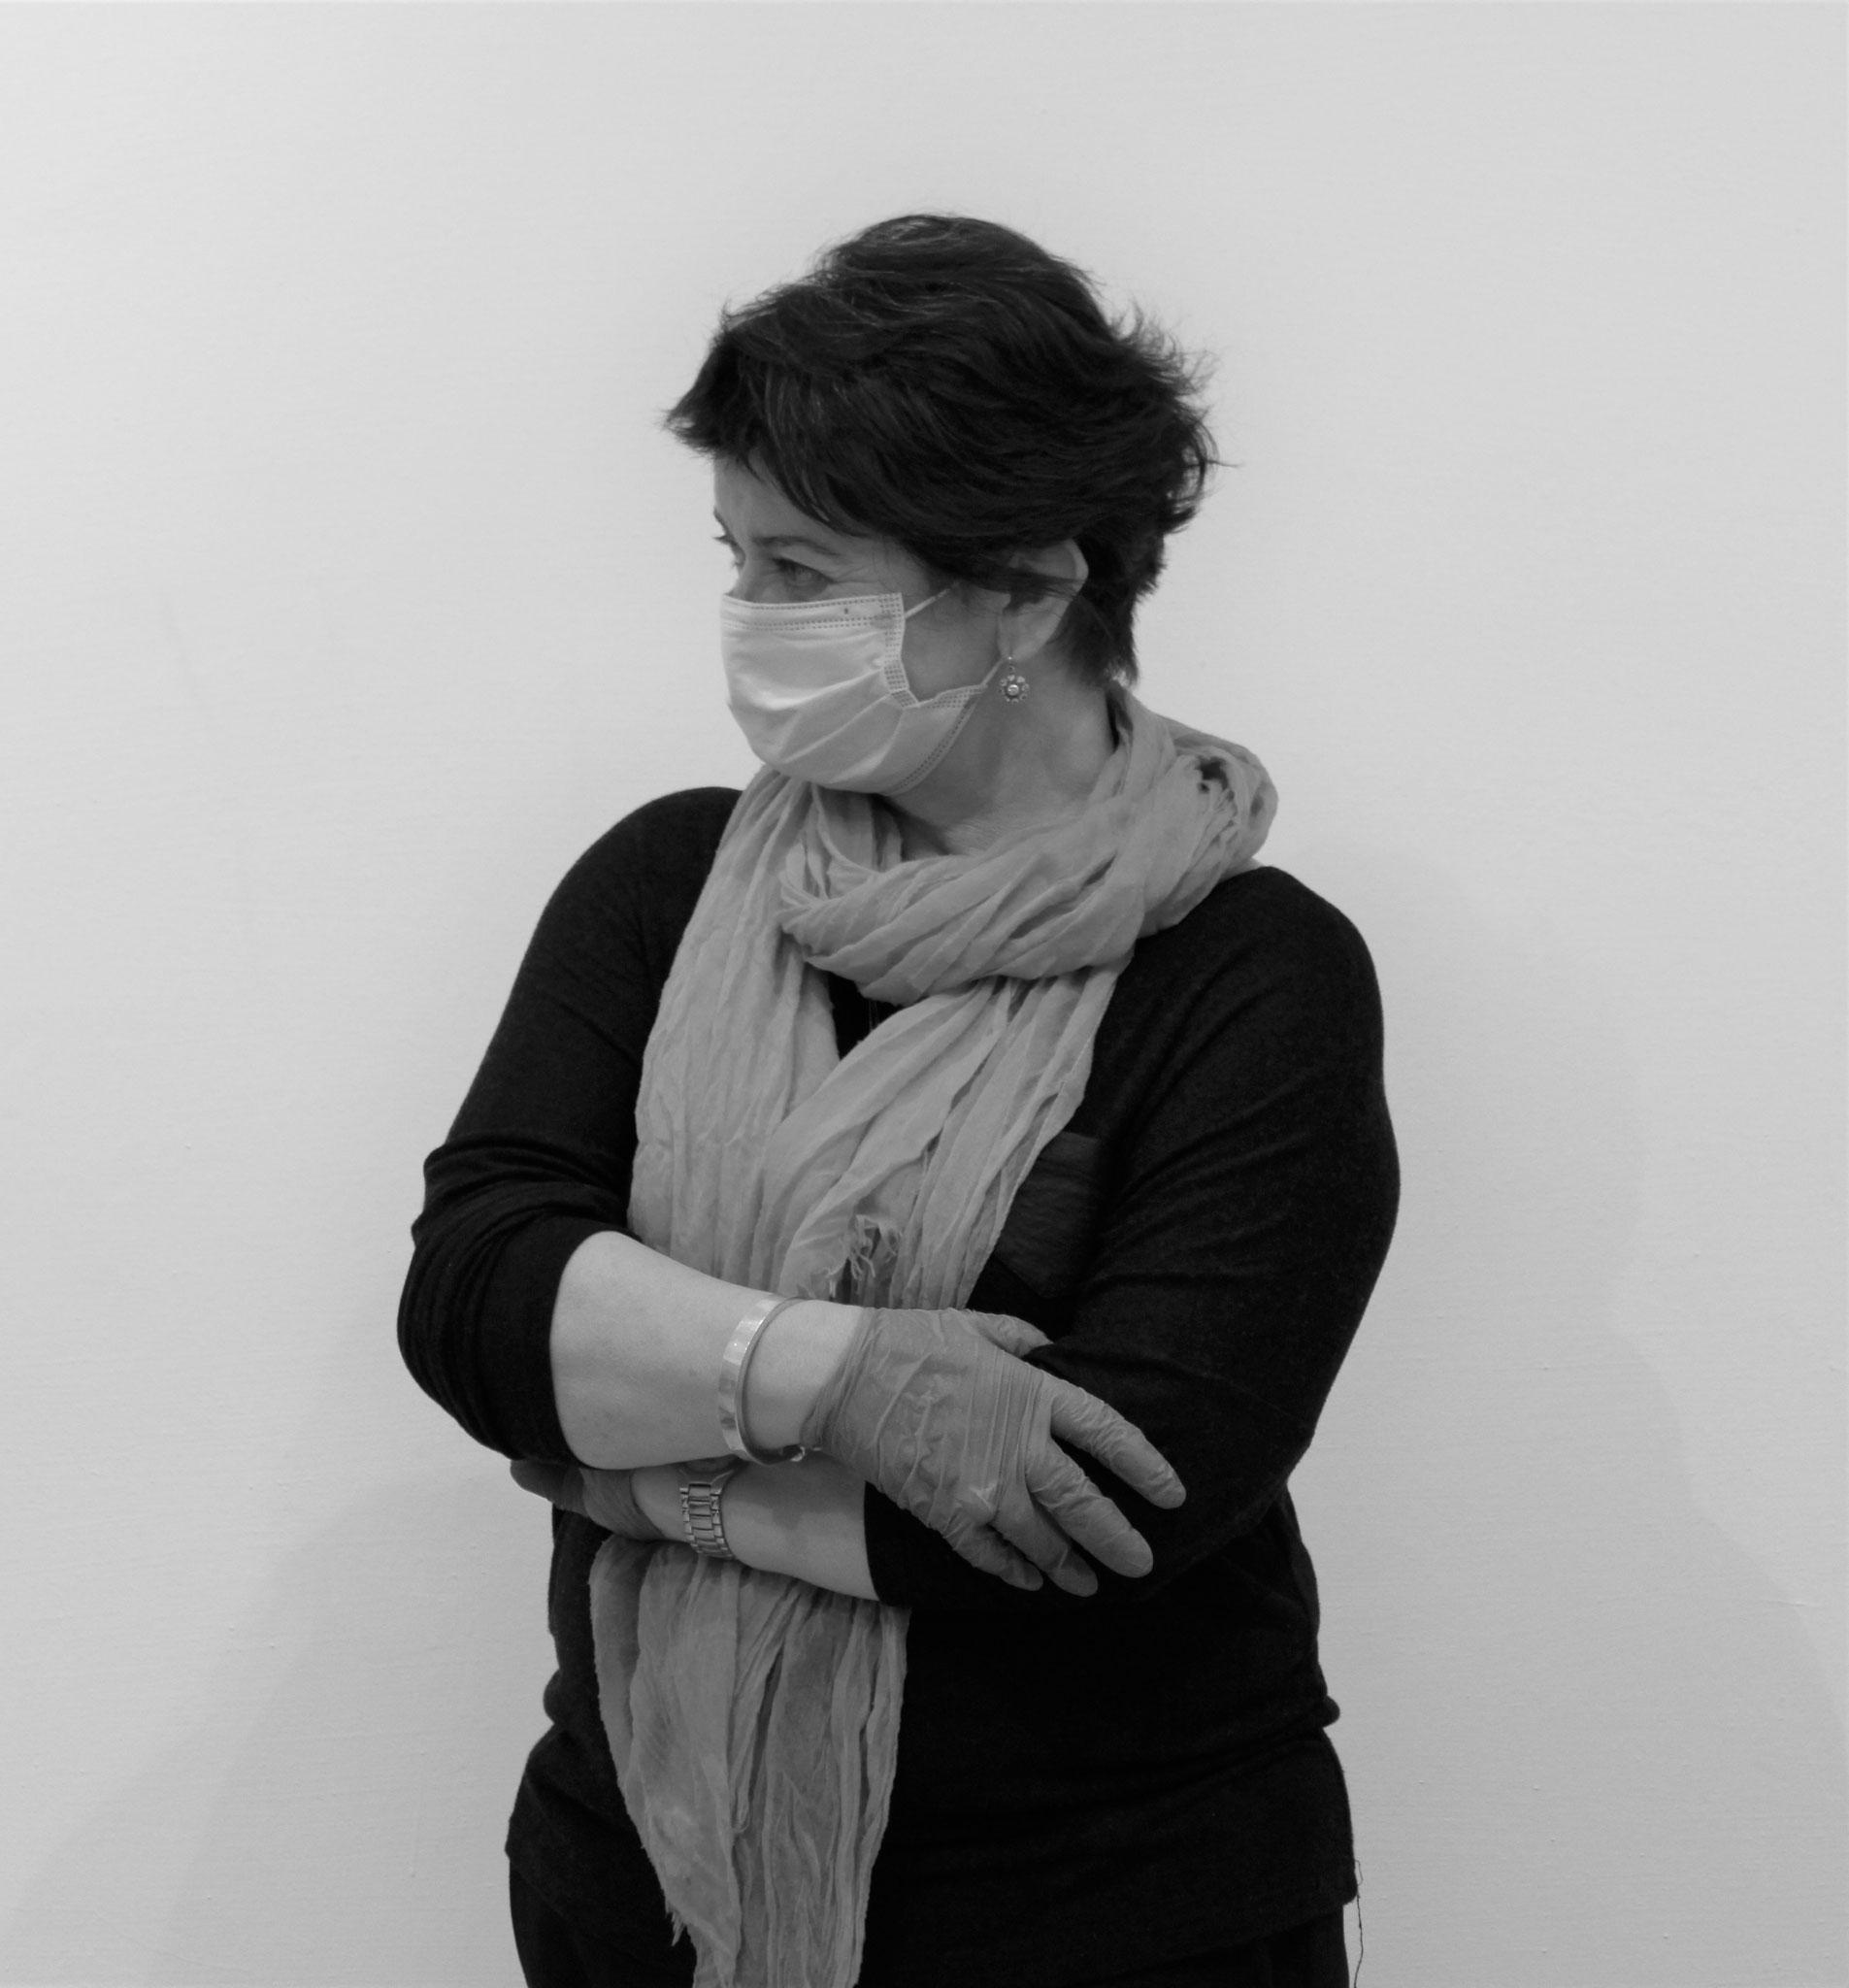 Foto Emeric Illés Imre